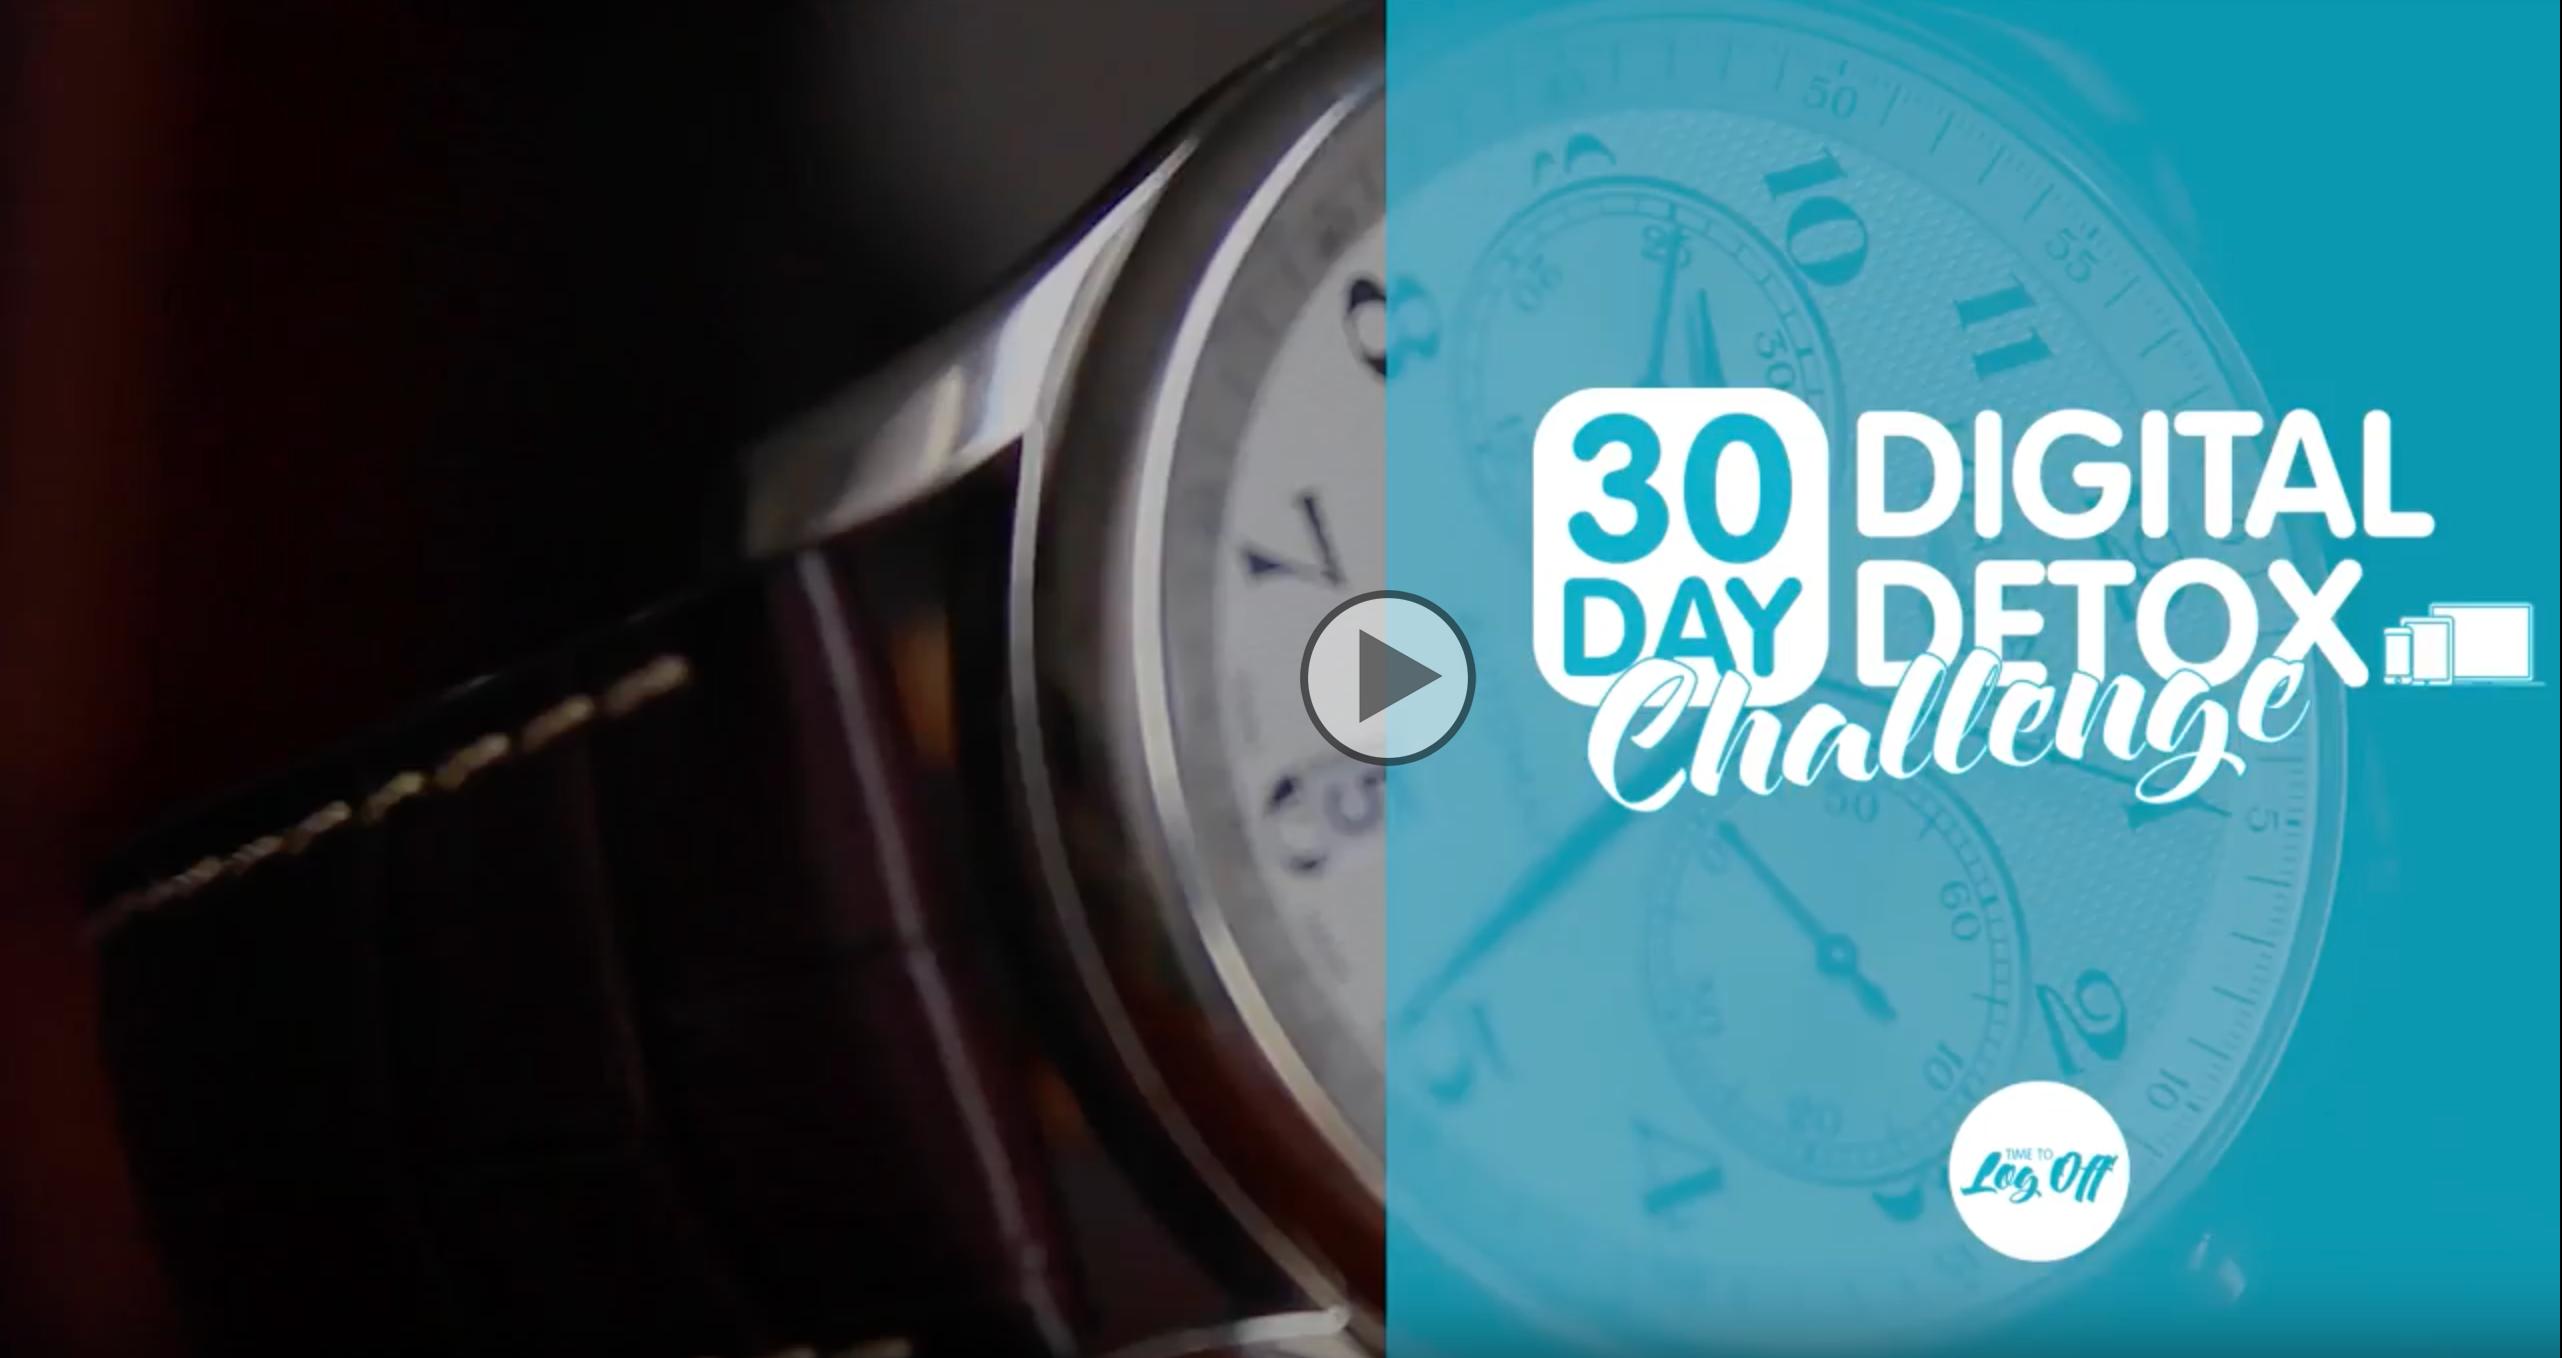 Time To Log Off Digital Detox Day 19